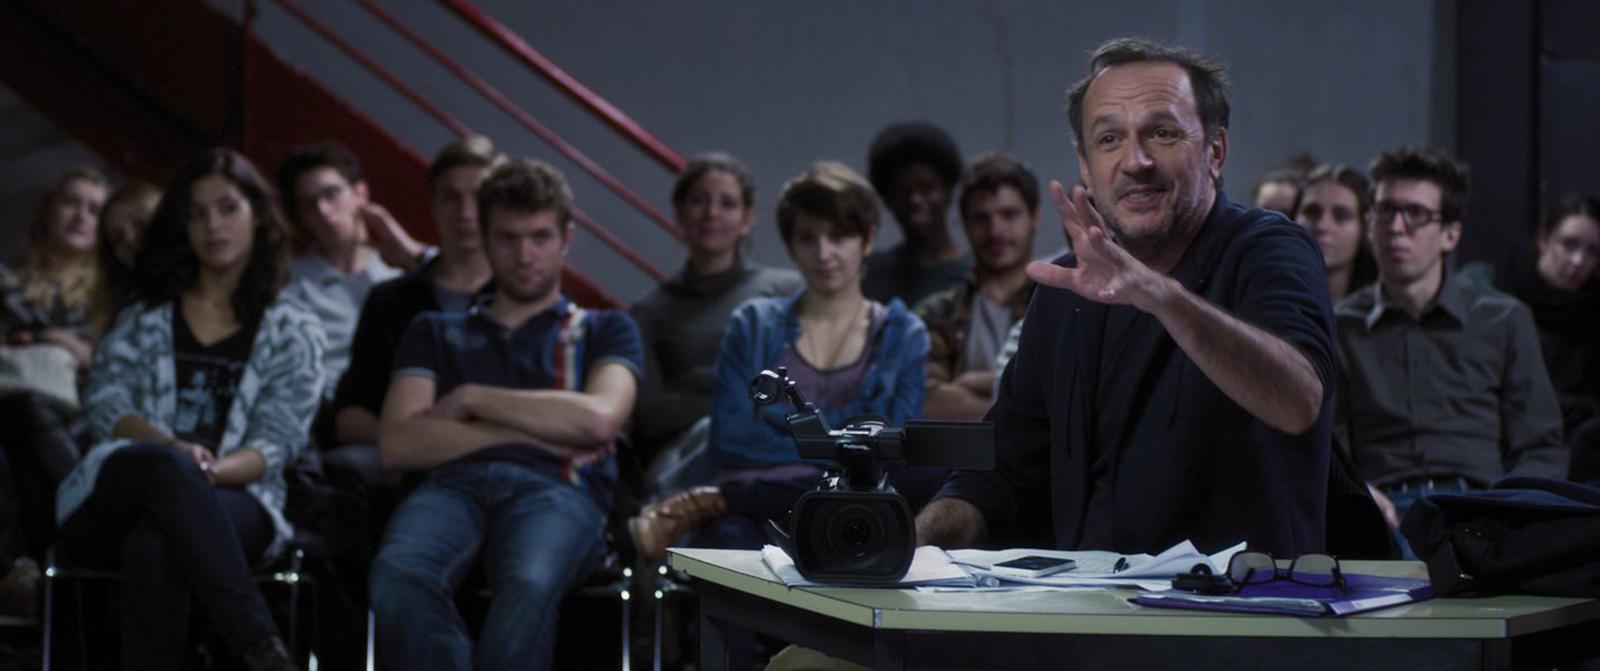 Arnaud fait son 2ème film : la deuxième vie d'Arnaud